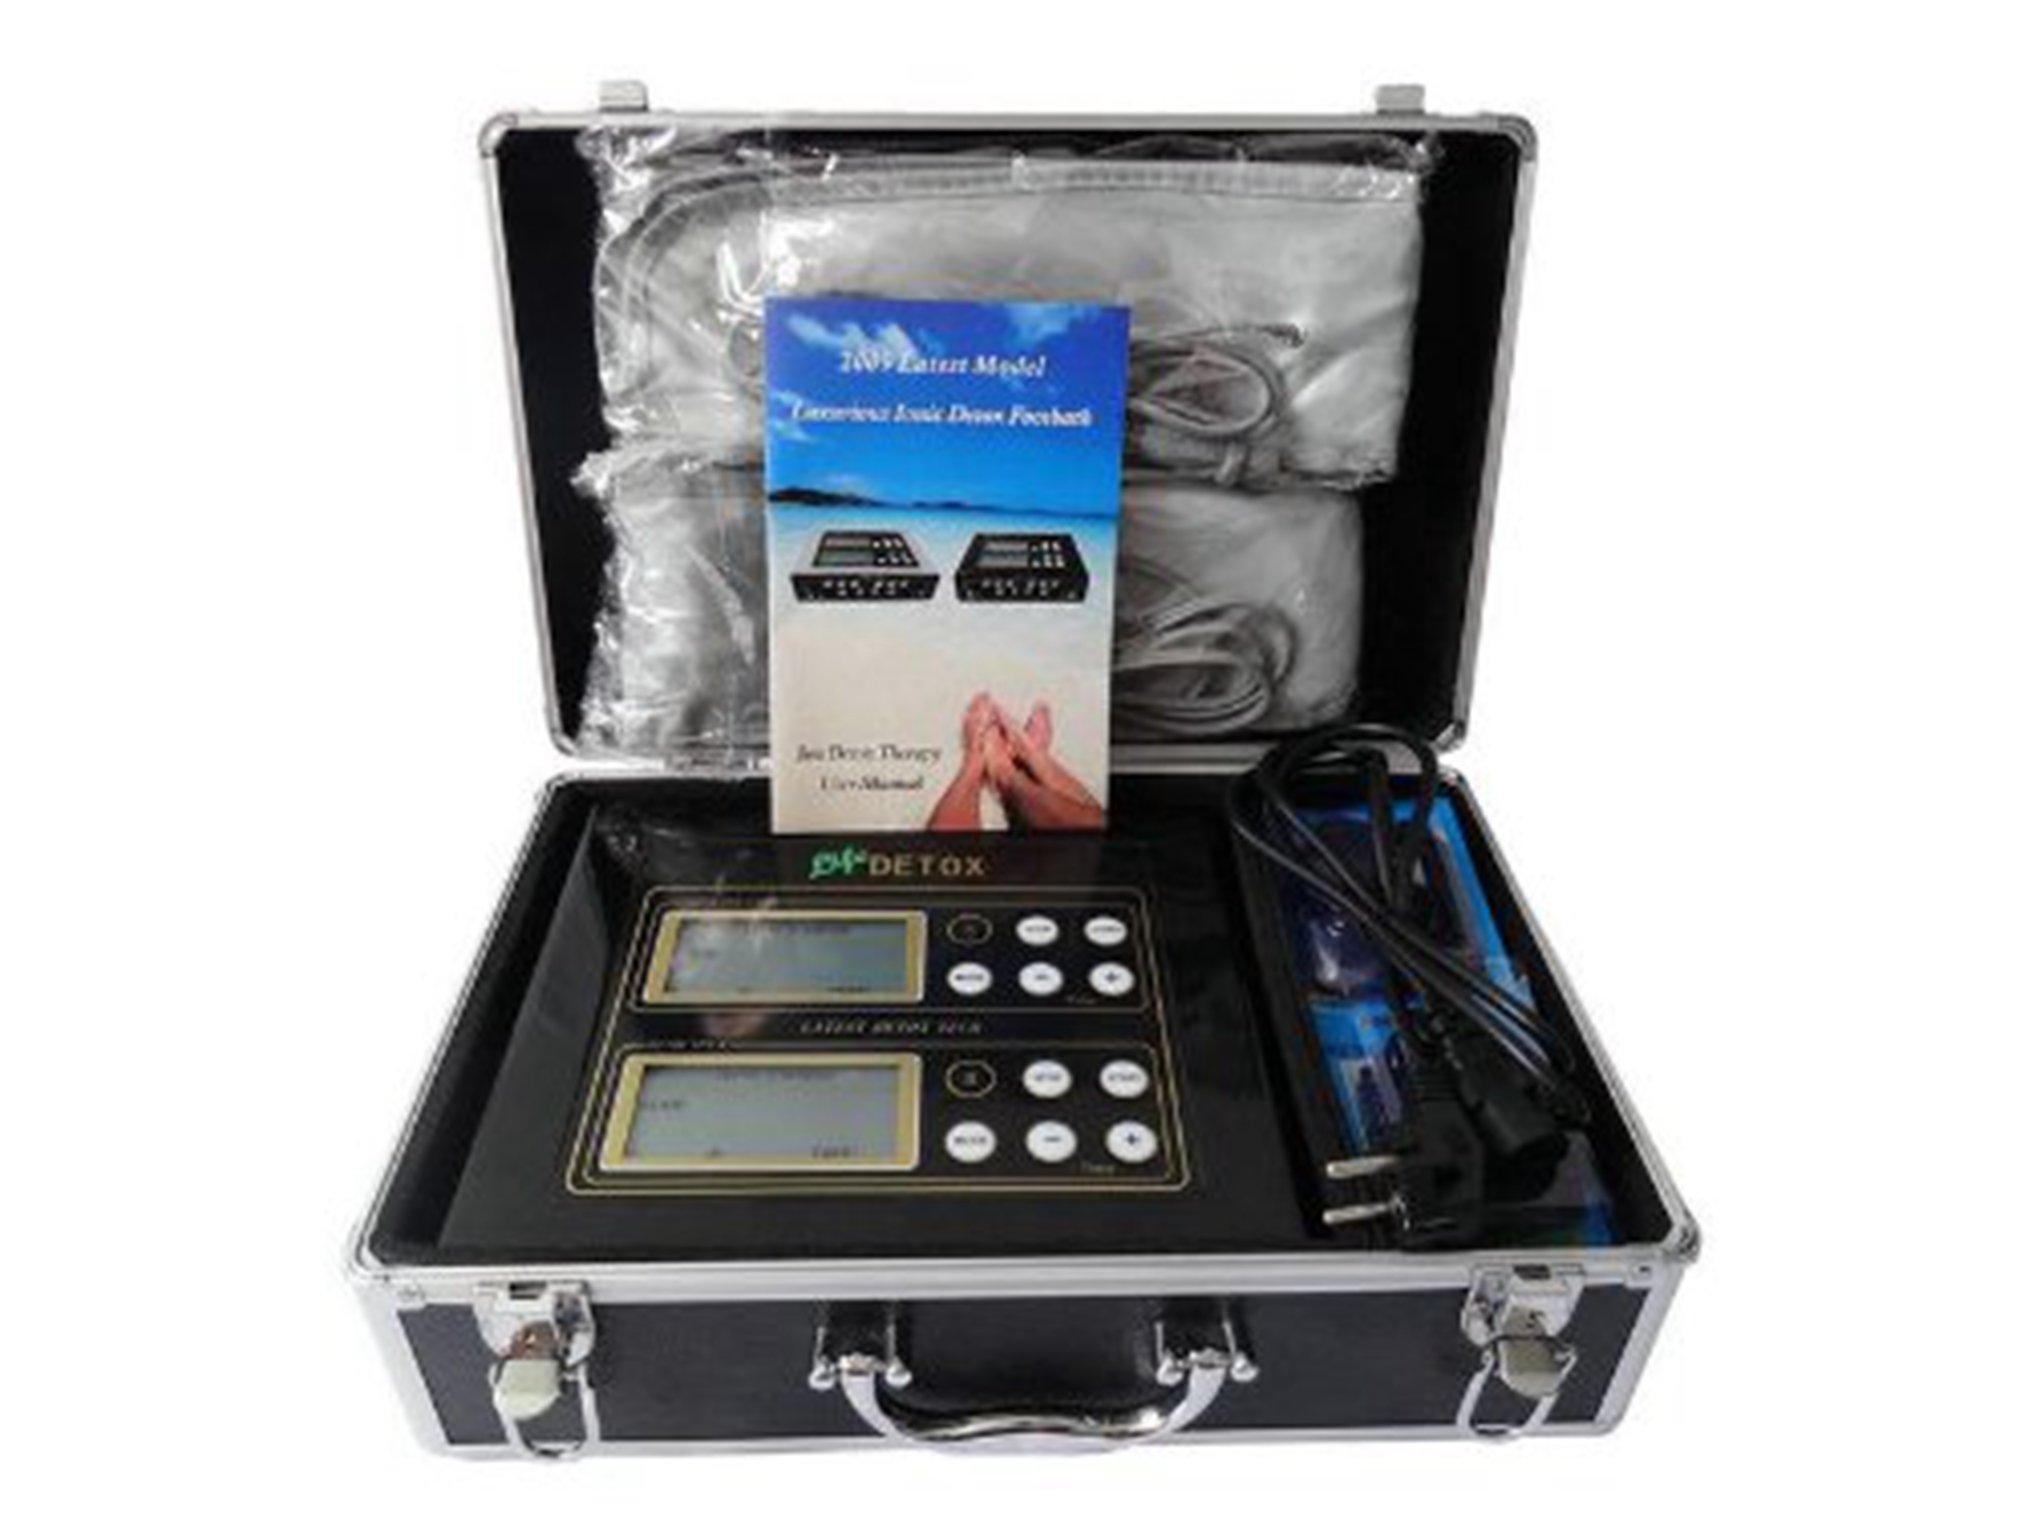 Detox Ion Ionic Aqua Foot Bath Spa Cleanse Machine Home Digital LCD Display Black Box (dual Style)